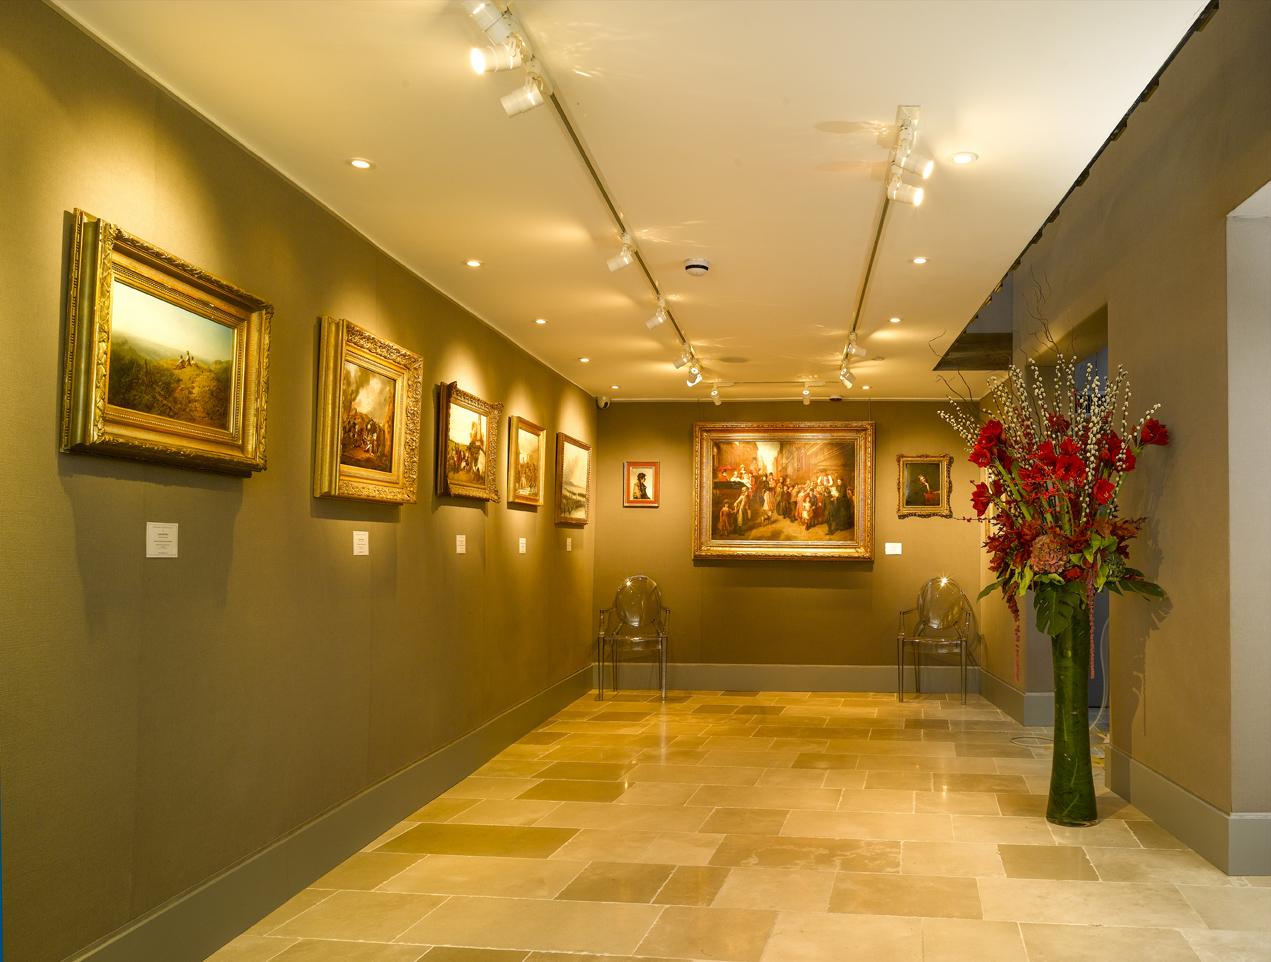 Interiors & Installations Gallery